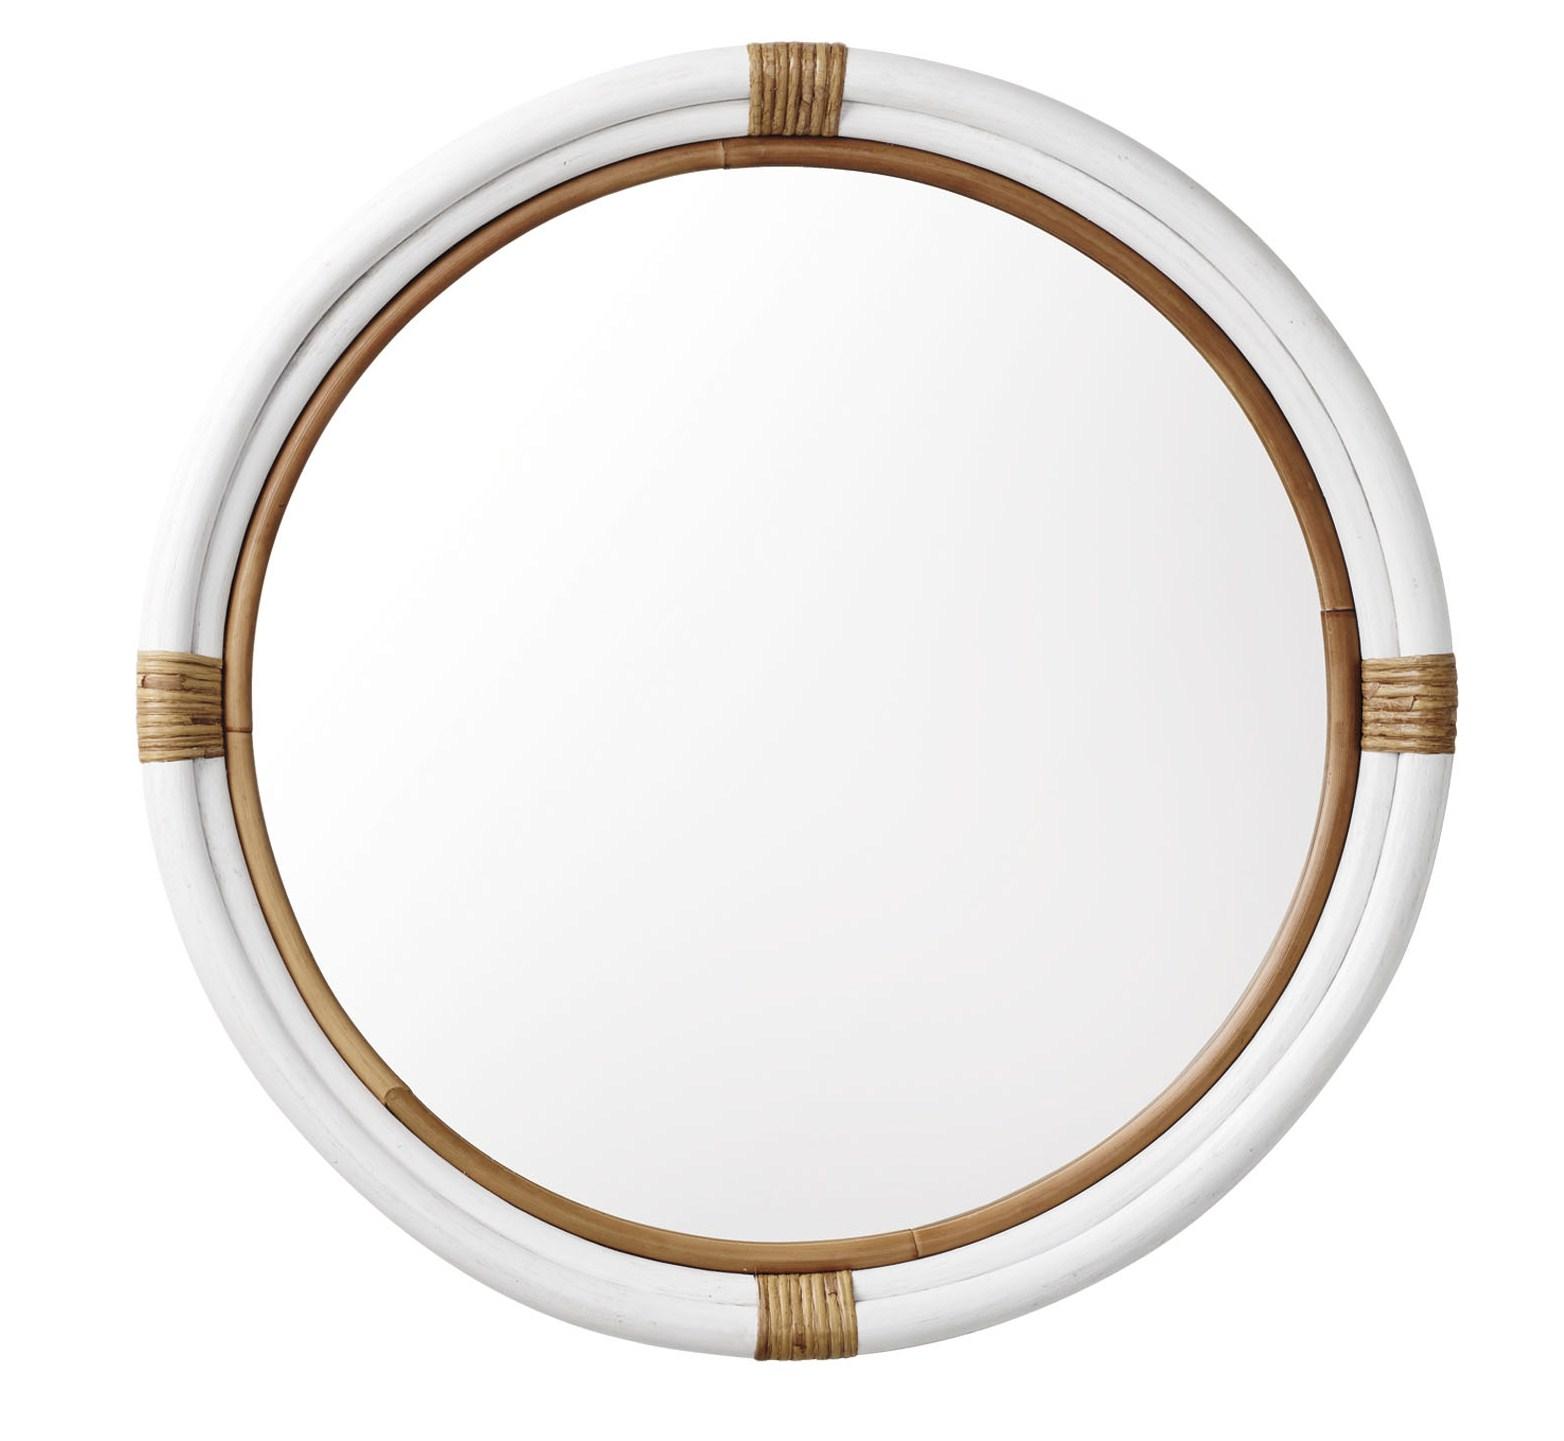 White round mirror with rattan trim